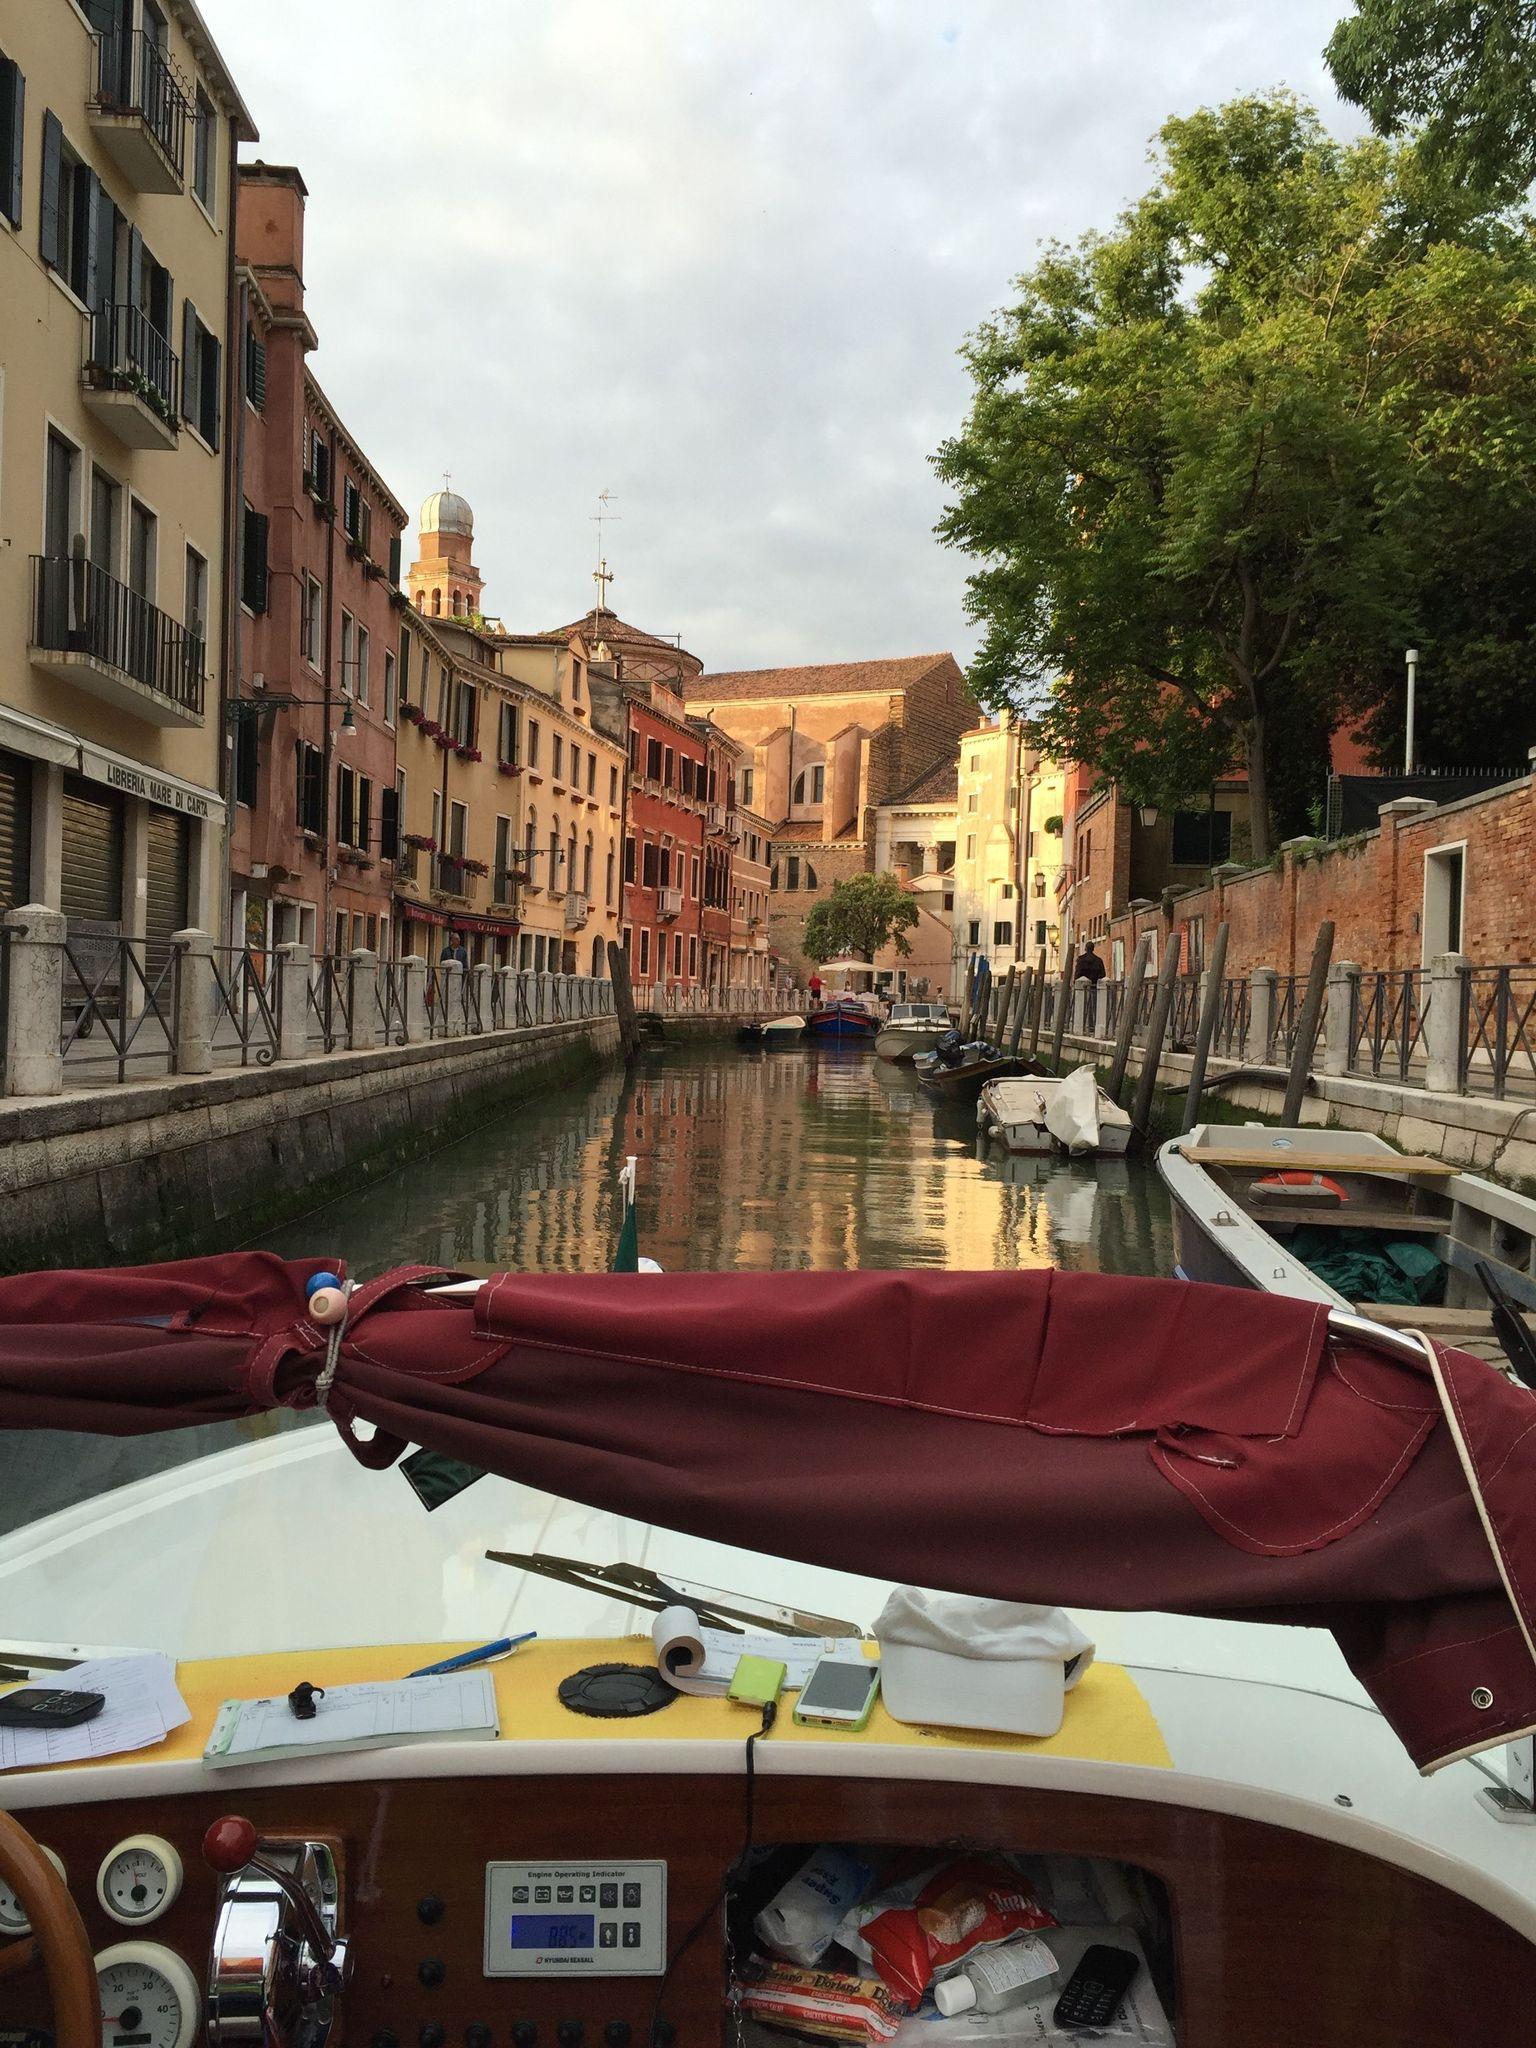 MAIS FOTOS, Traslado de partida e transferência do Aeroporto Marco Polo de Veneza